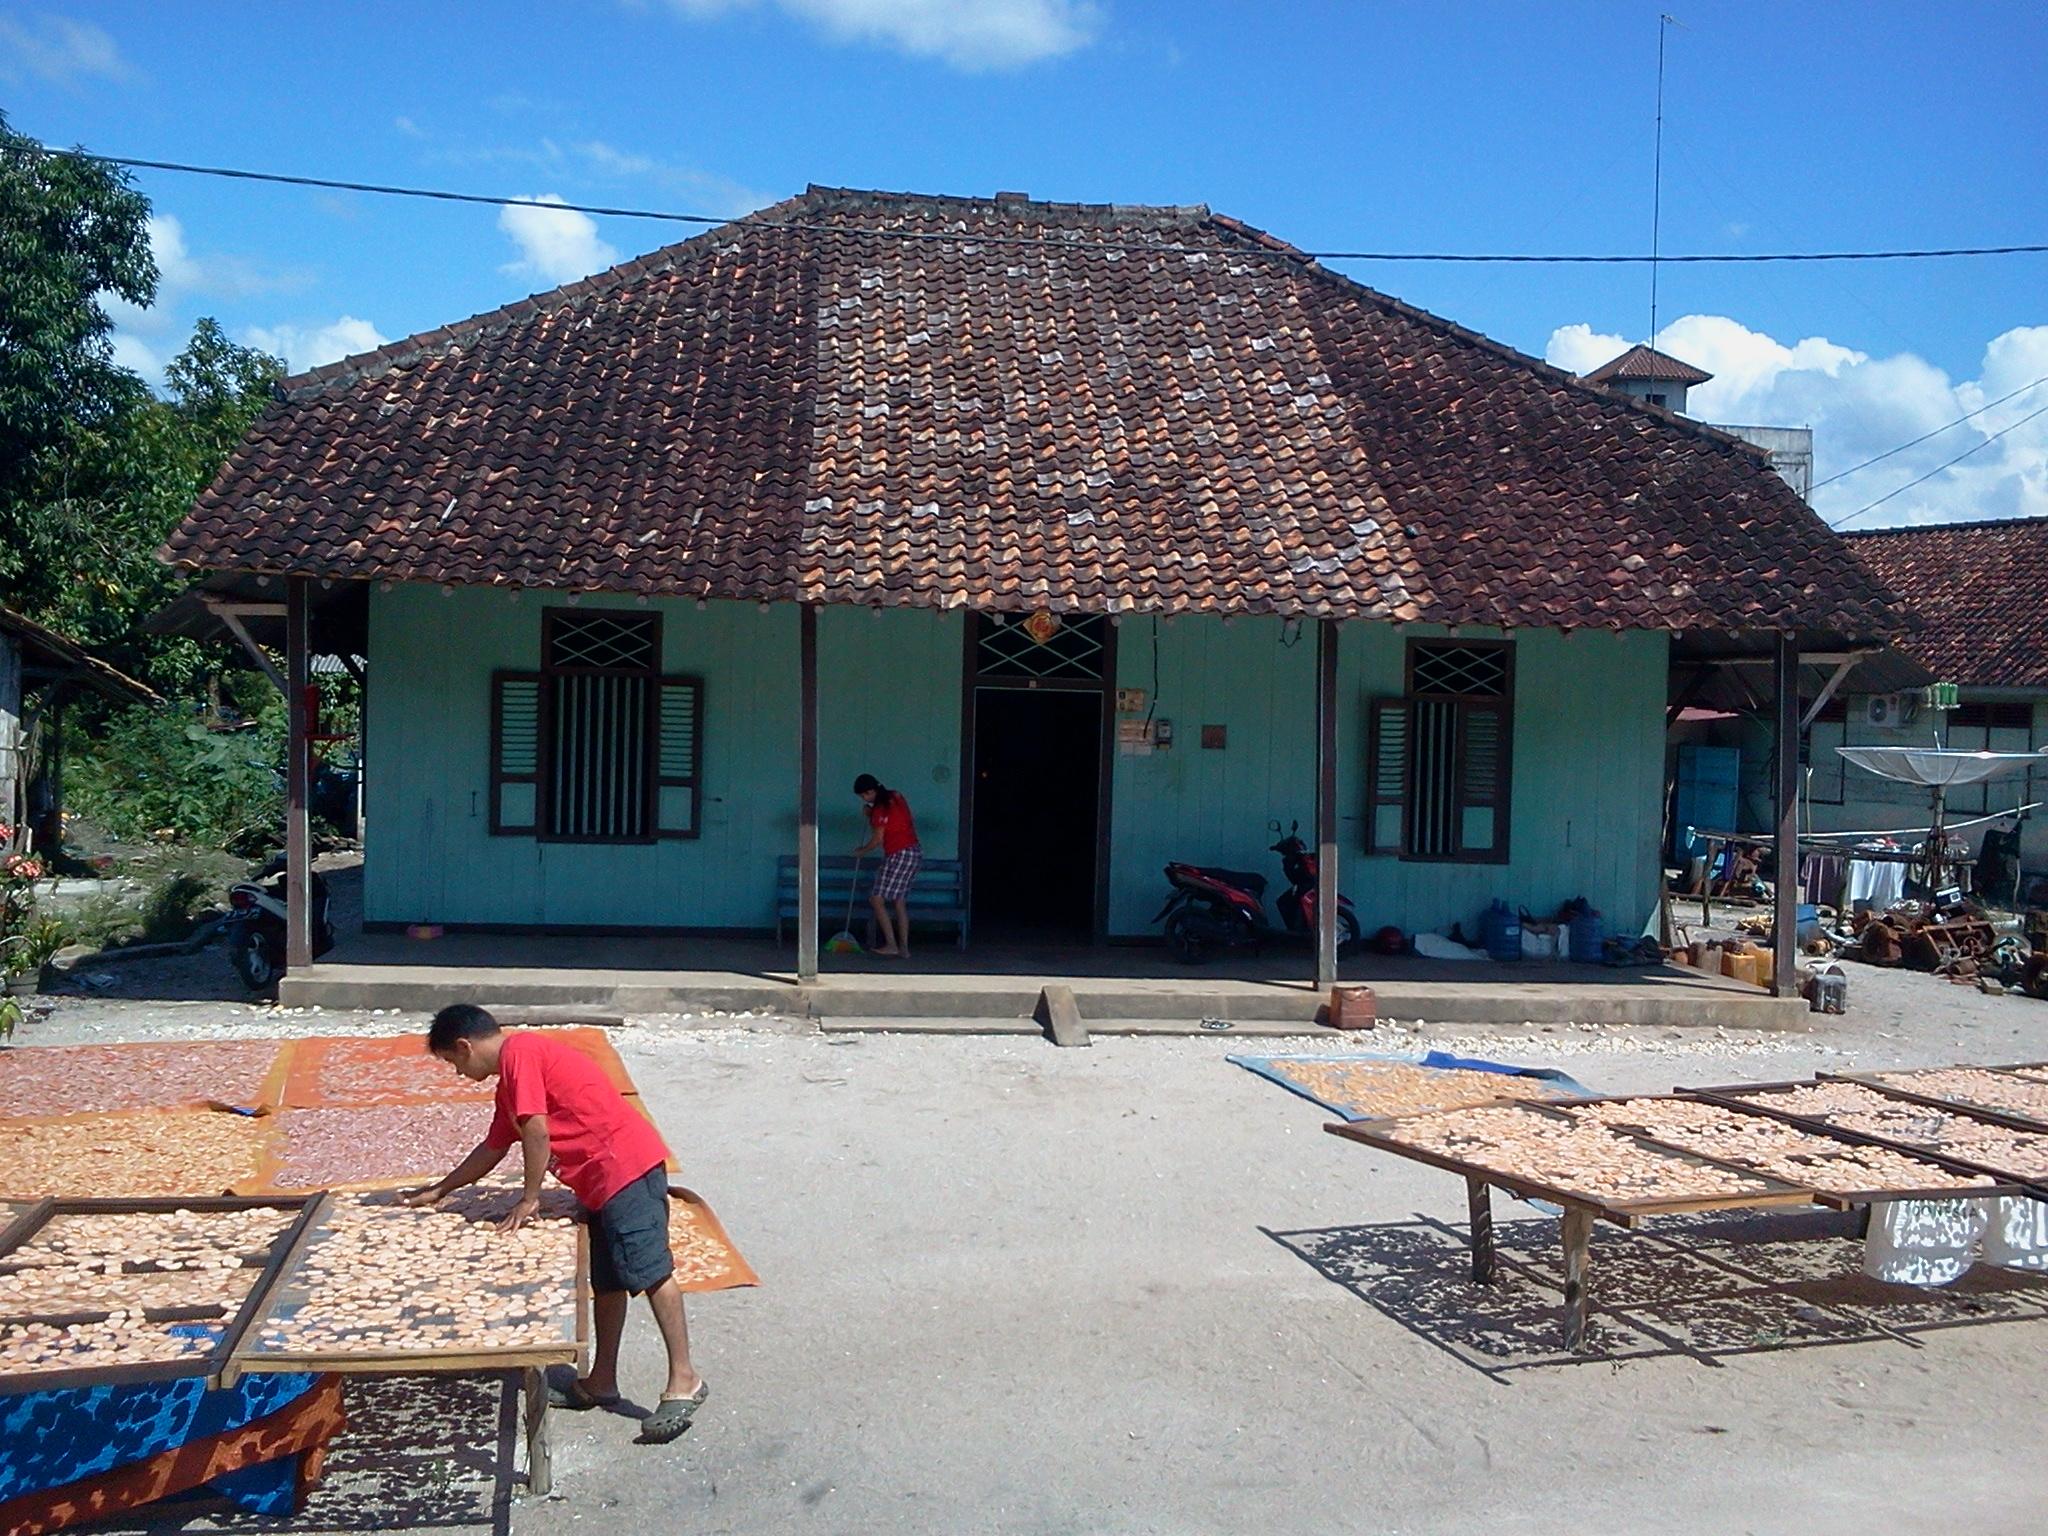 File Suasana Kampung Cina Di Dusun Lumut Belinyu Bangka Belitung